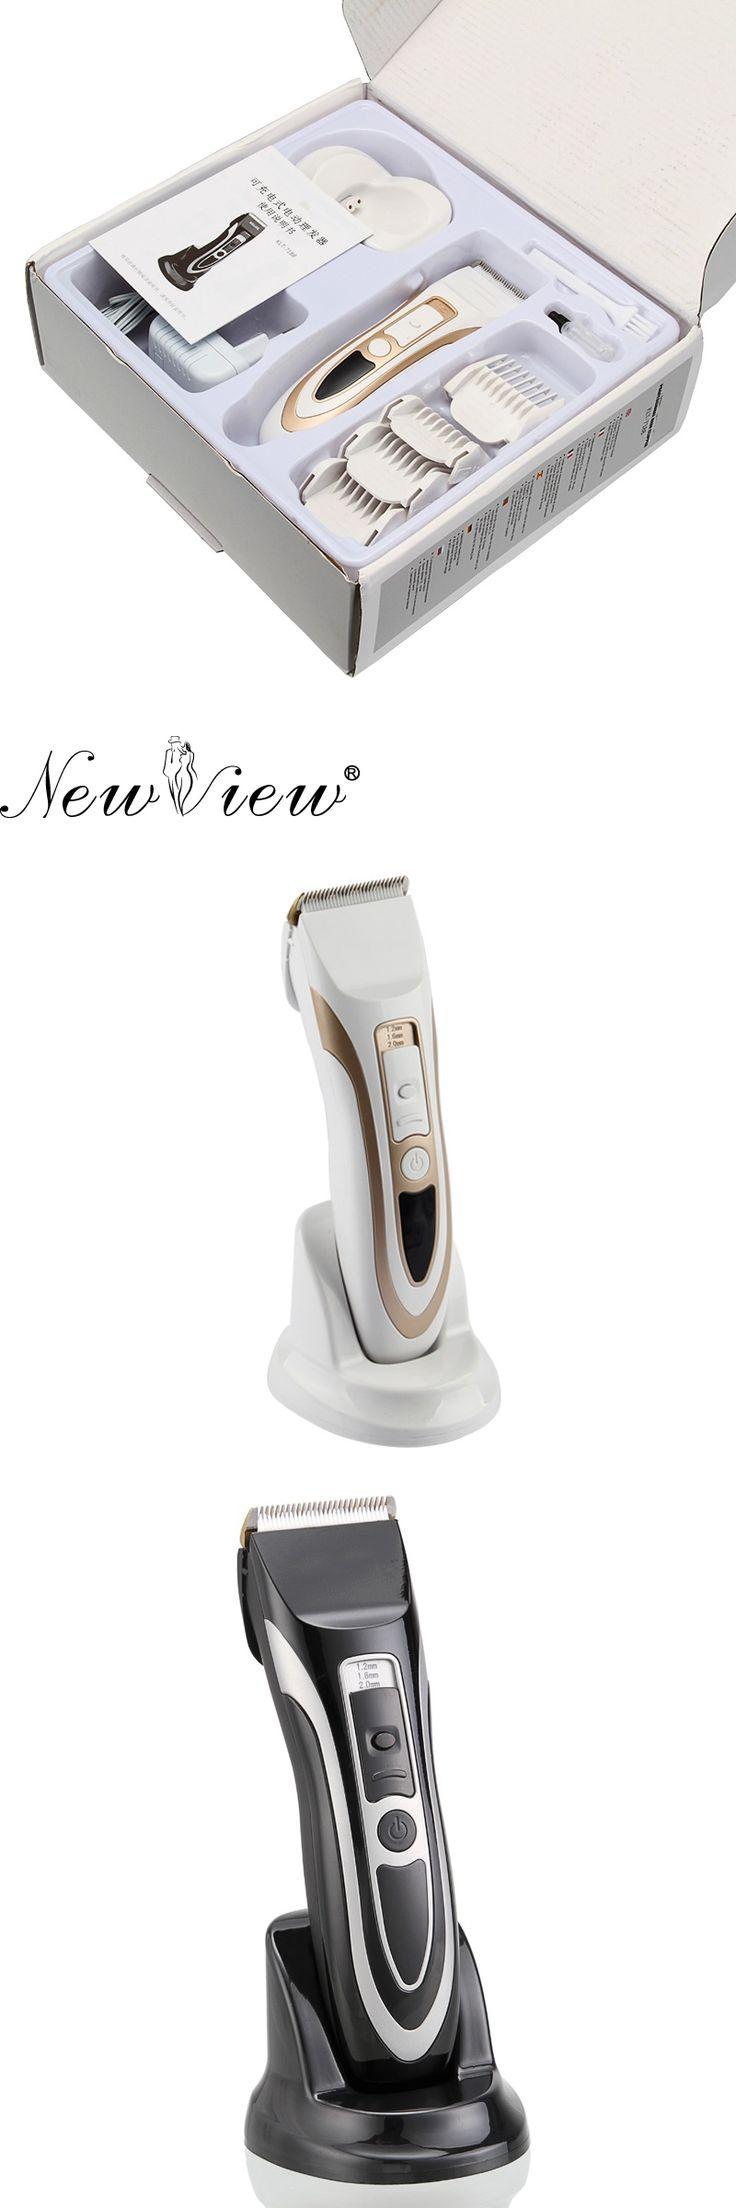 NewView Electric Hair Clipper Rechargeable Beard Trimmer Hairclipper Hair Cutter Machine Hair Trimmer